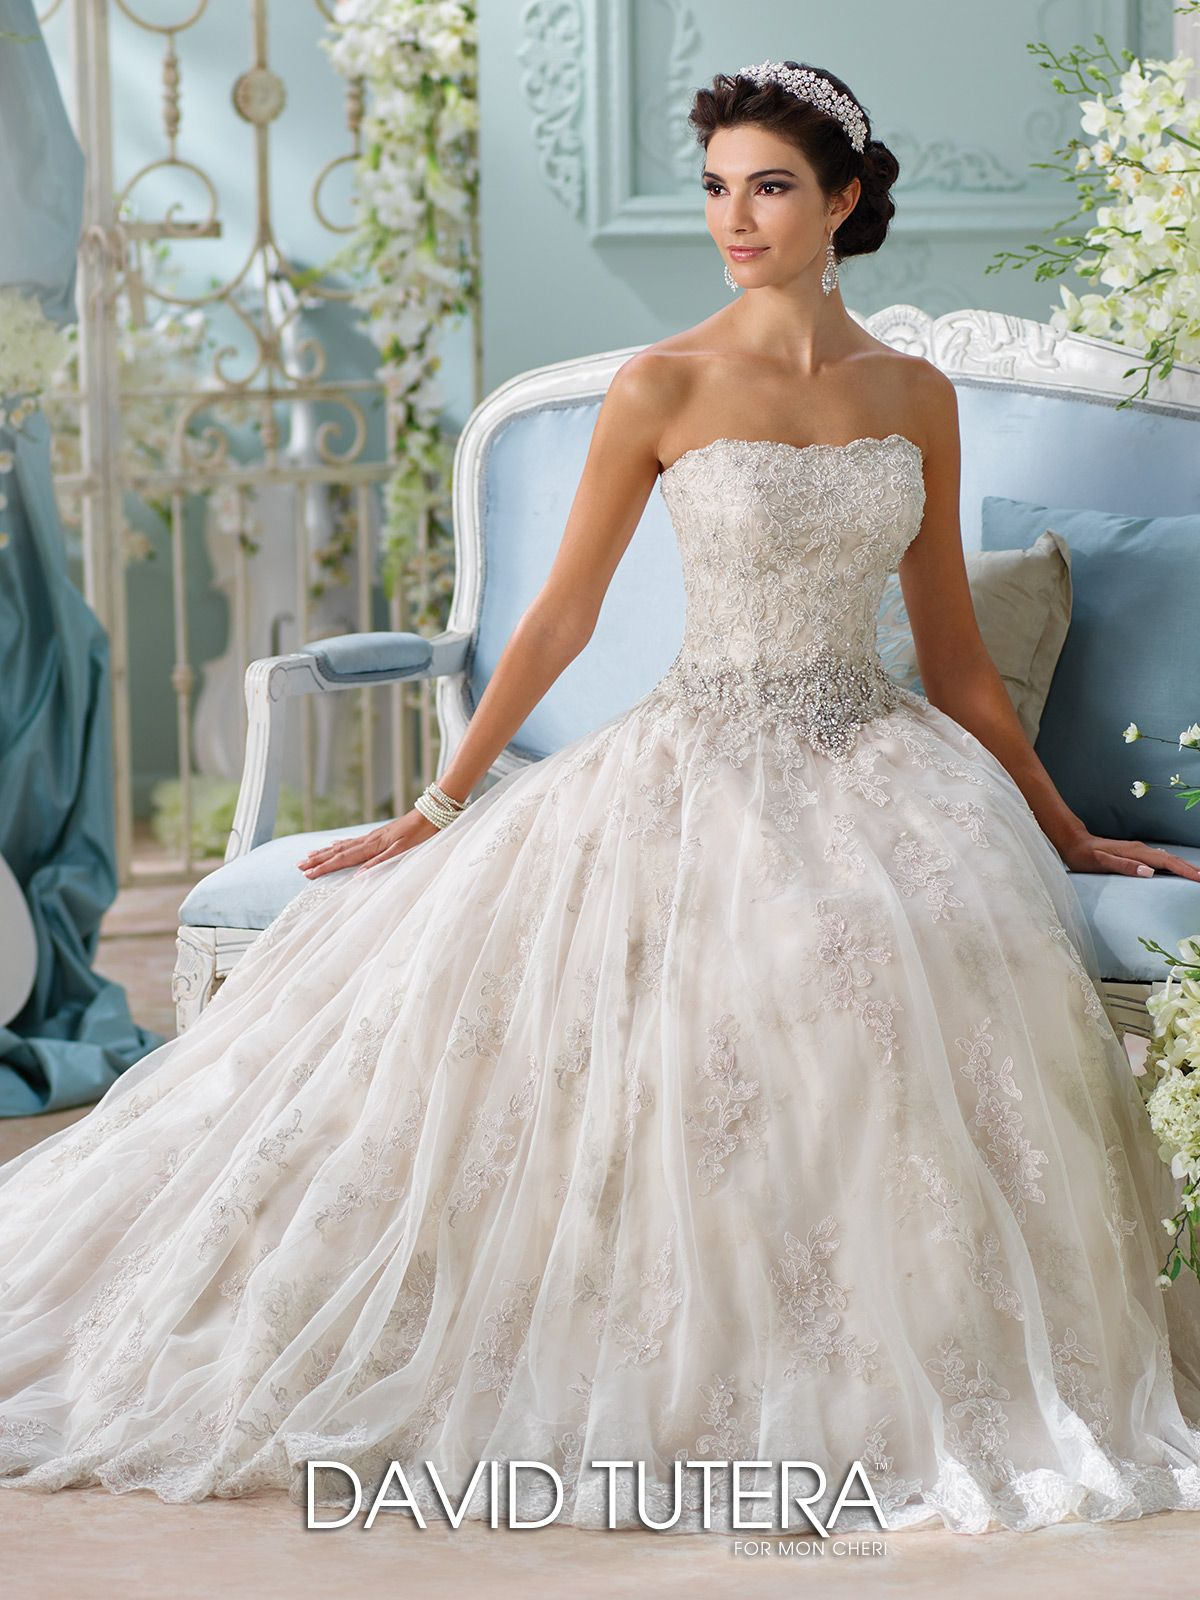 Unique wedding dresses fall martin thornburg luv dat dress